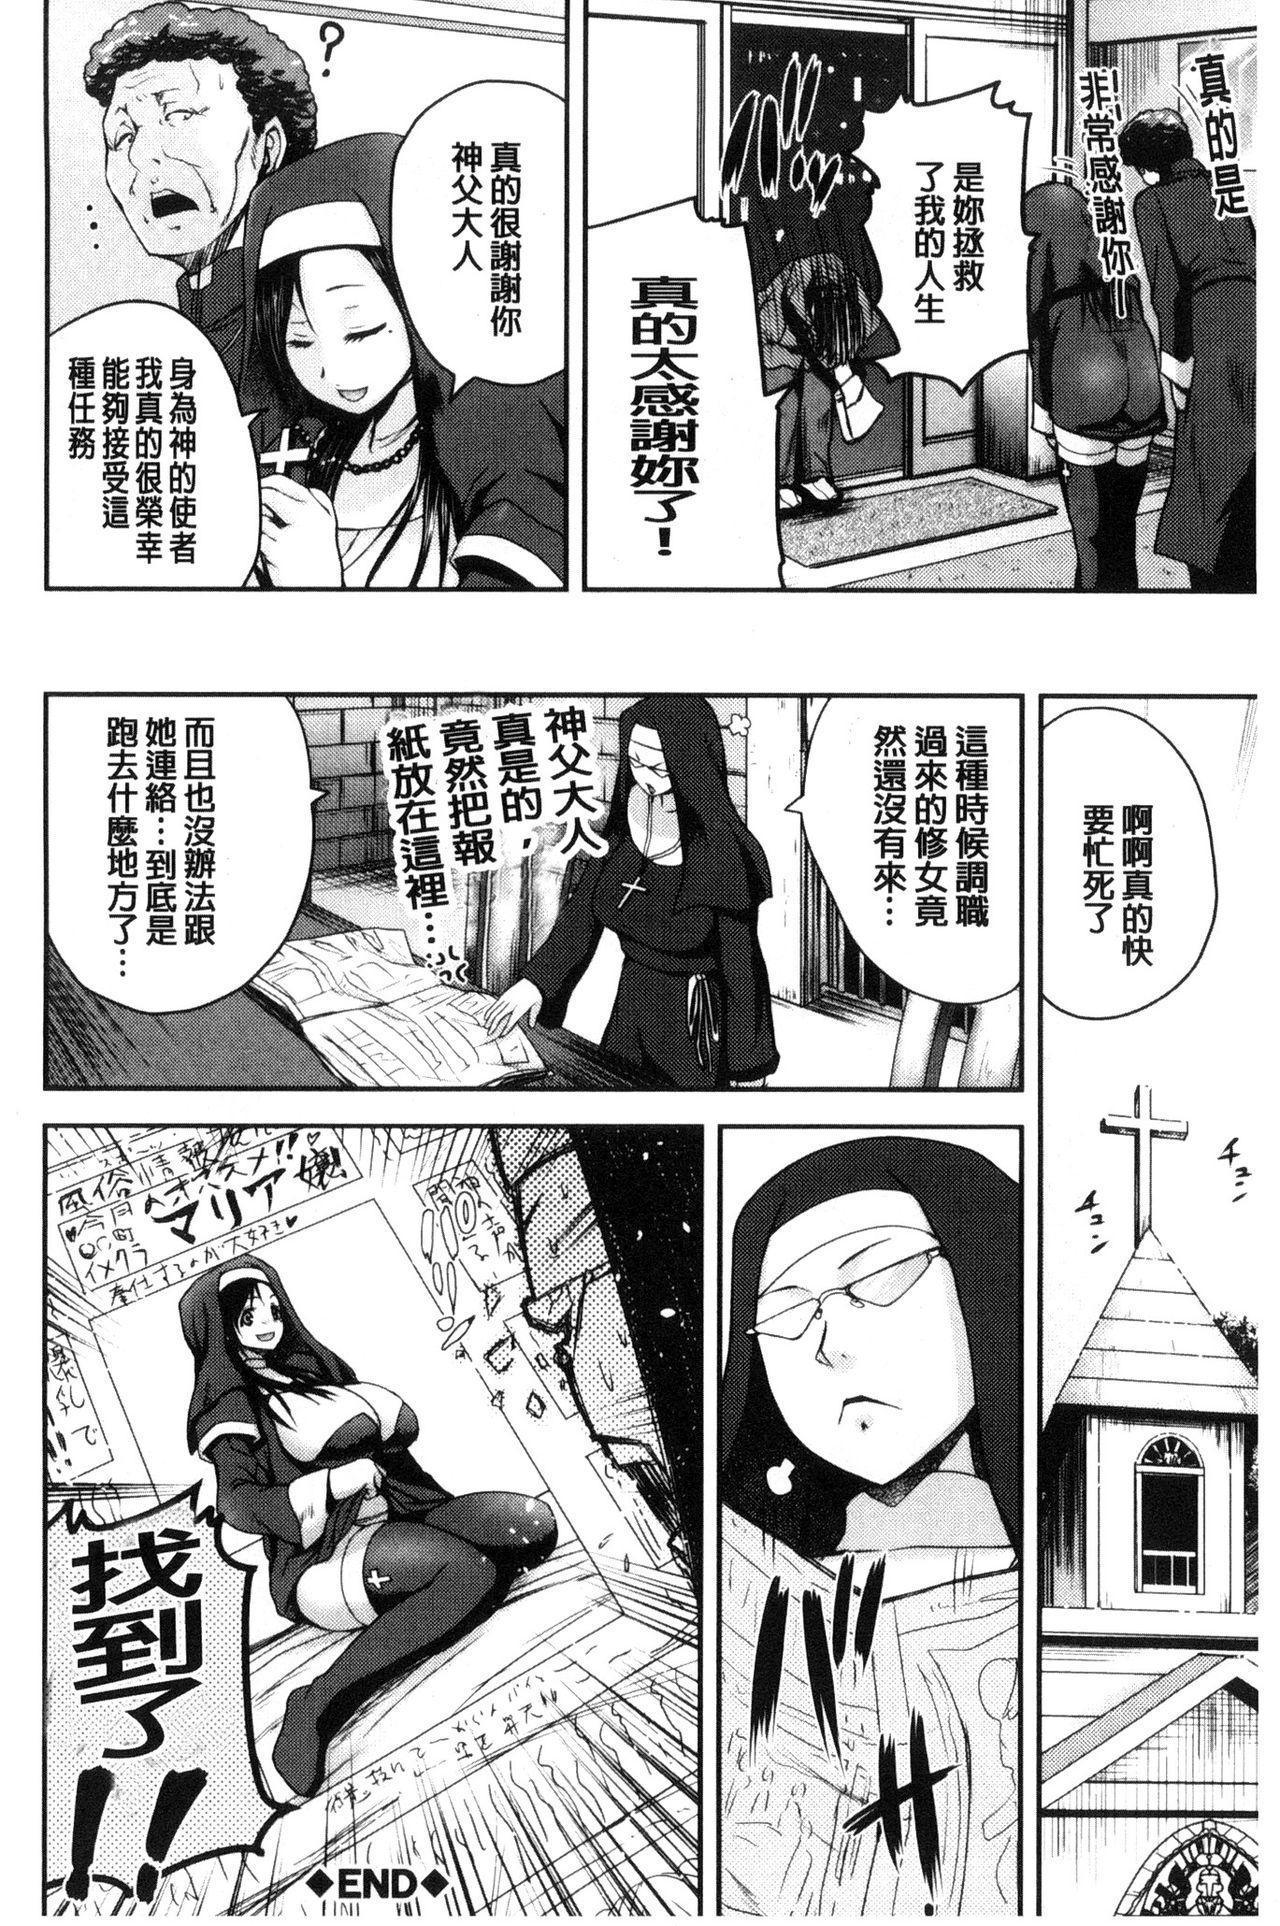 Opink Health Seibo no Fukuin 34